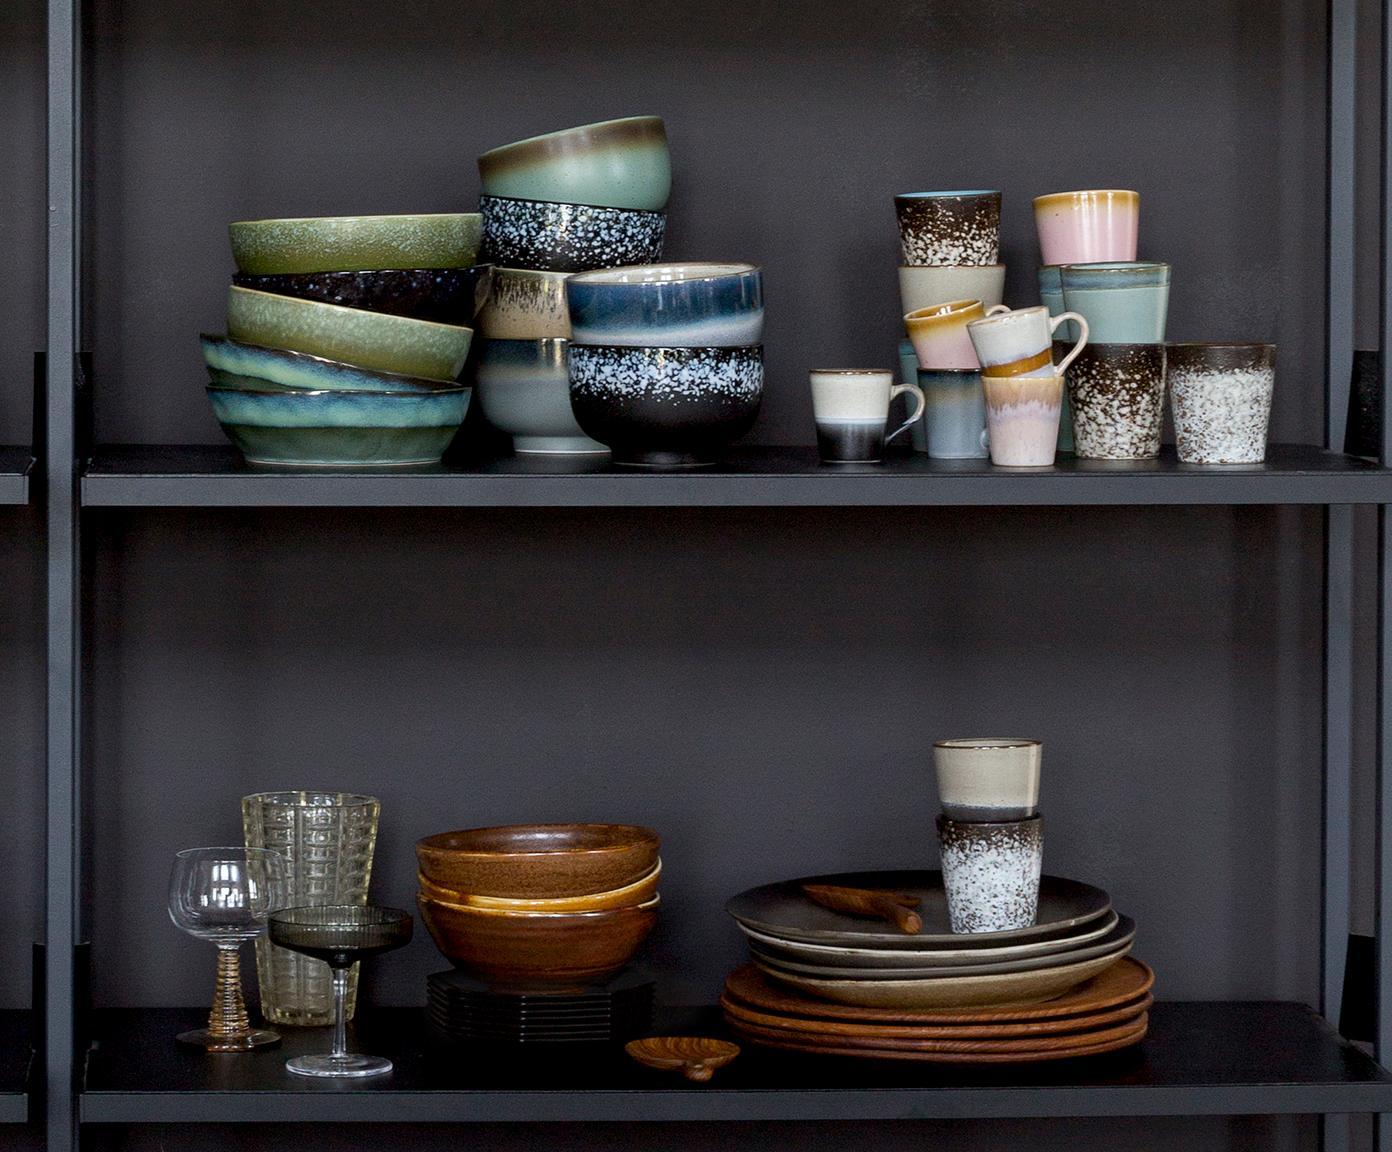 Handgemachtes XS Becher-Set 70's, 6-tlg., Keramik, Rosa, Beige, Blau, Ø 8 x H 8 cm